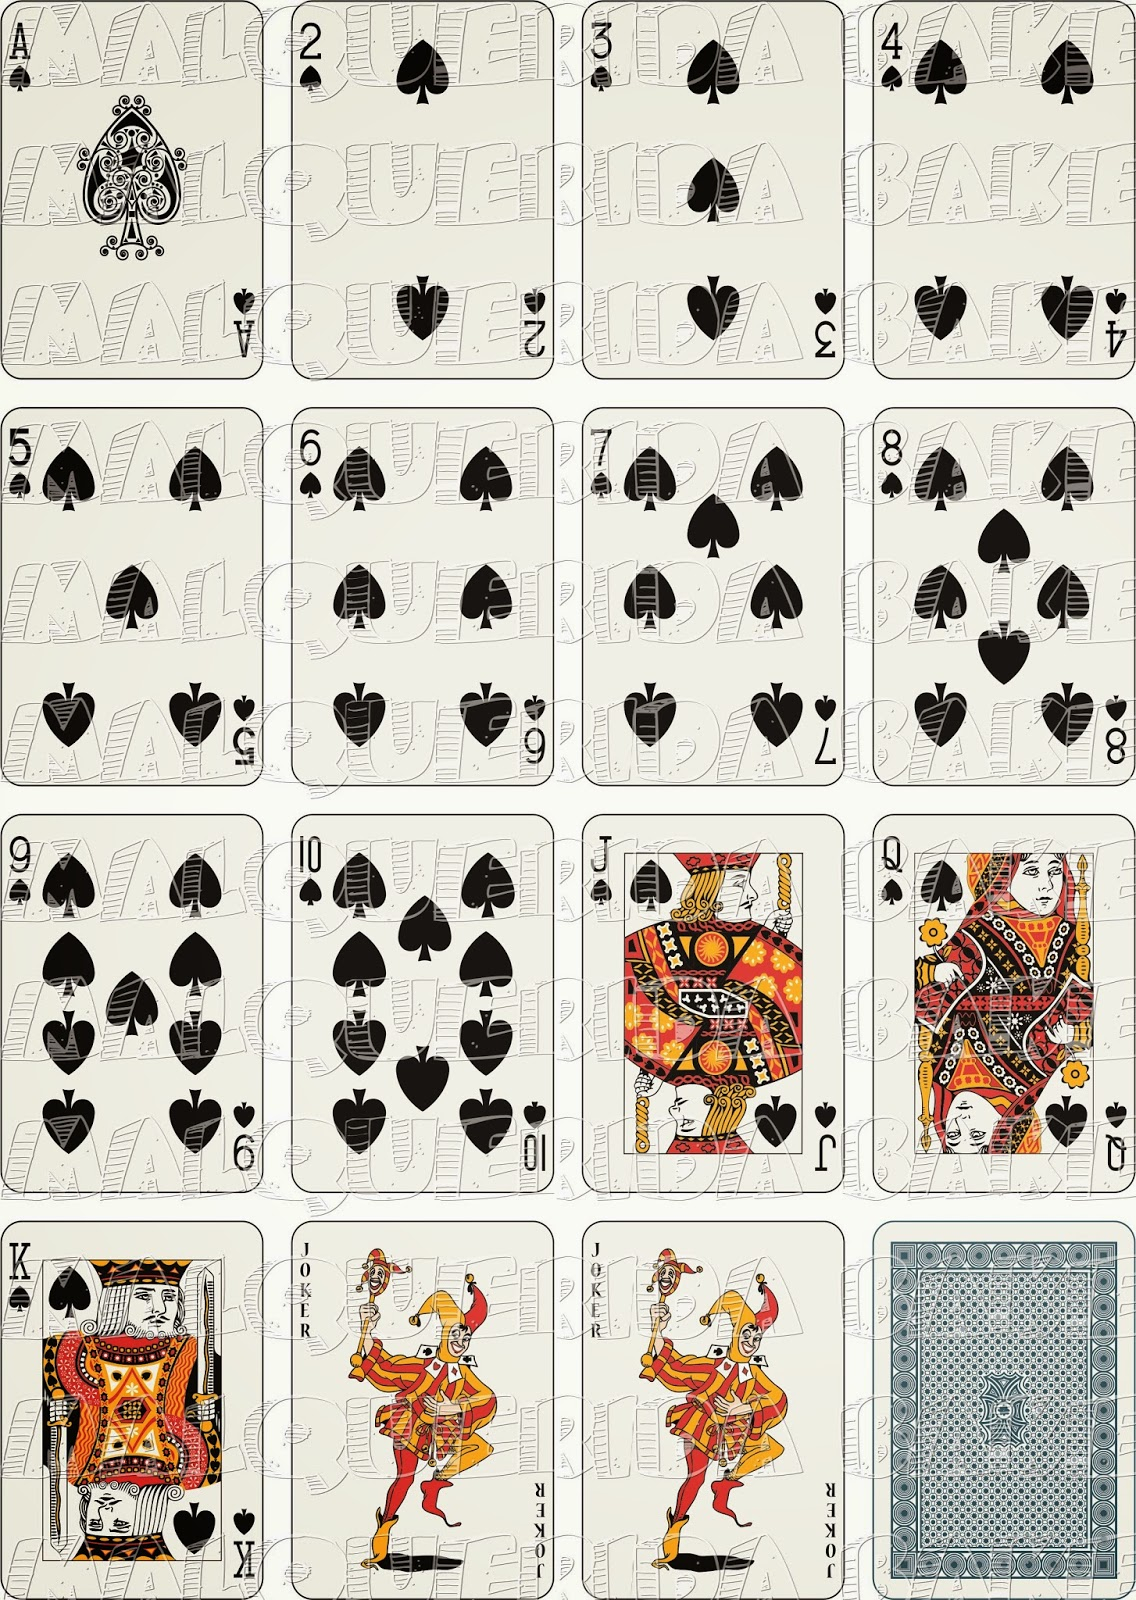 http://malqueridabakery.com/impresiones/988-poker-picas.html